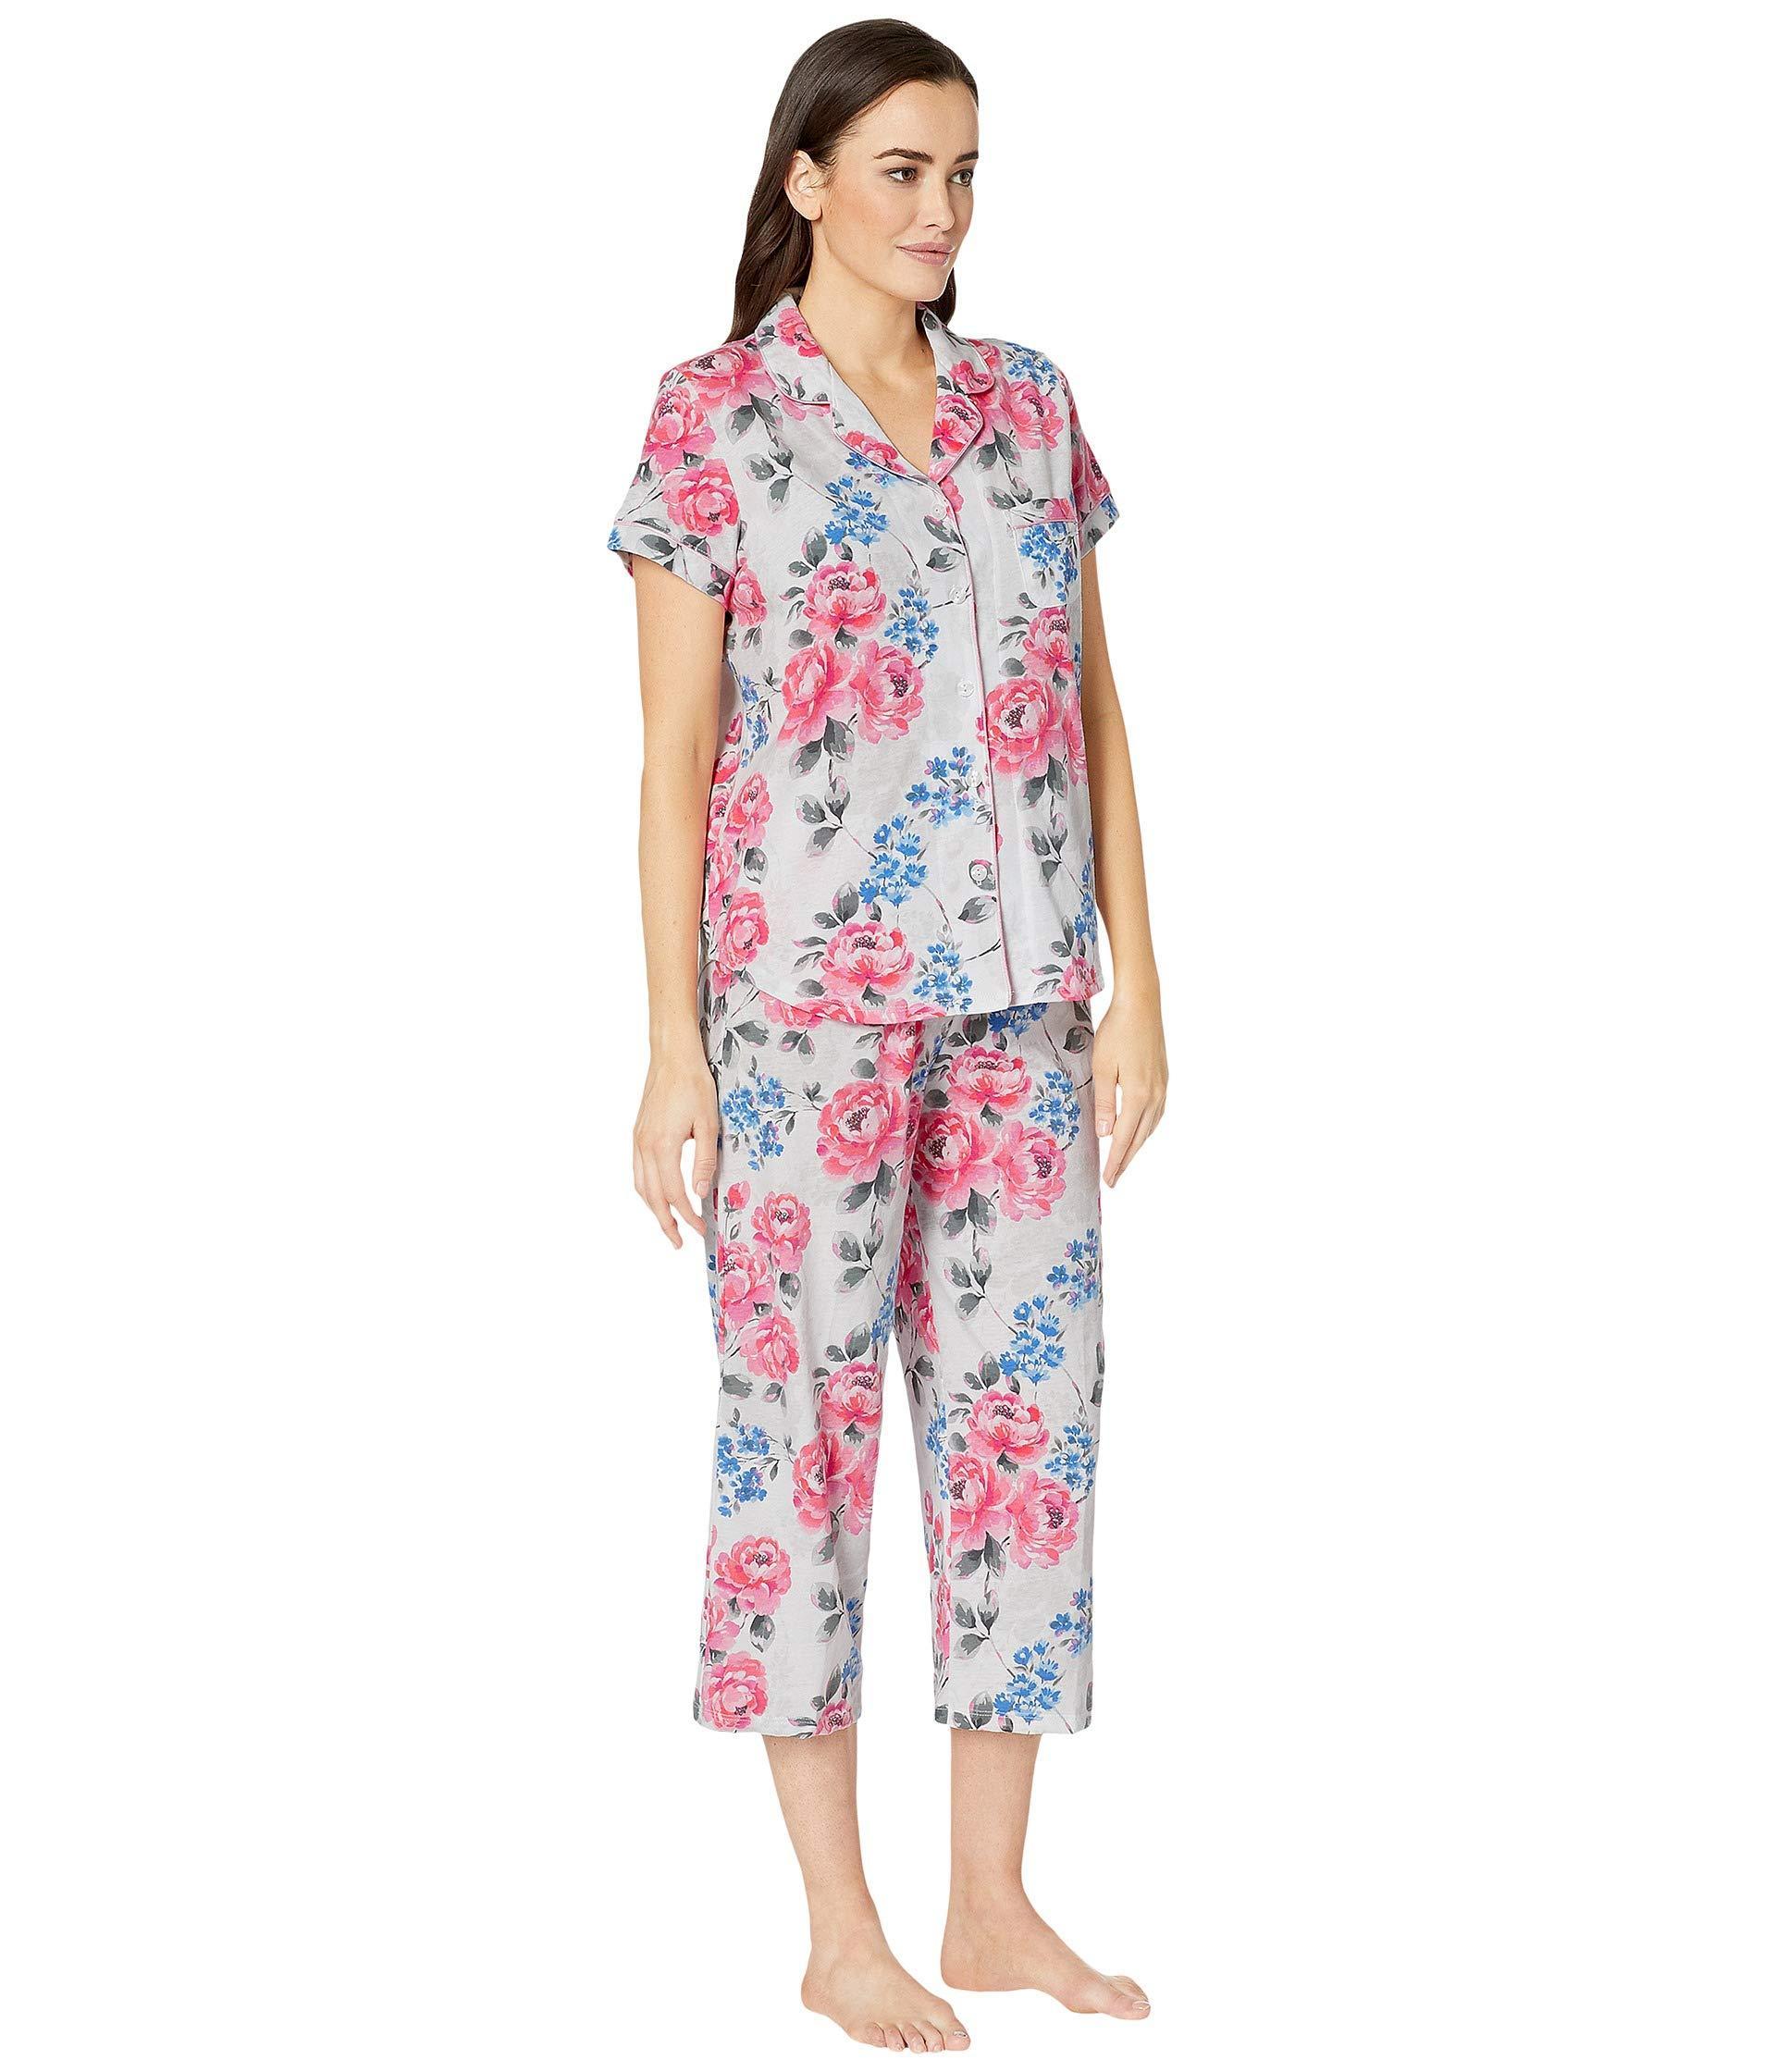 Karen Neuburger Womens Plus Size Cosmopolitan Short Sleeve Bermuda Set